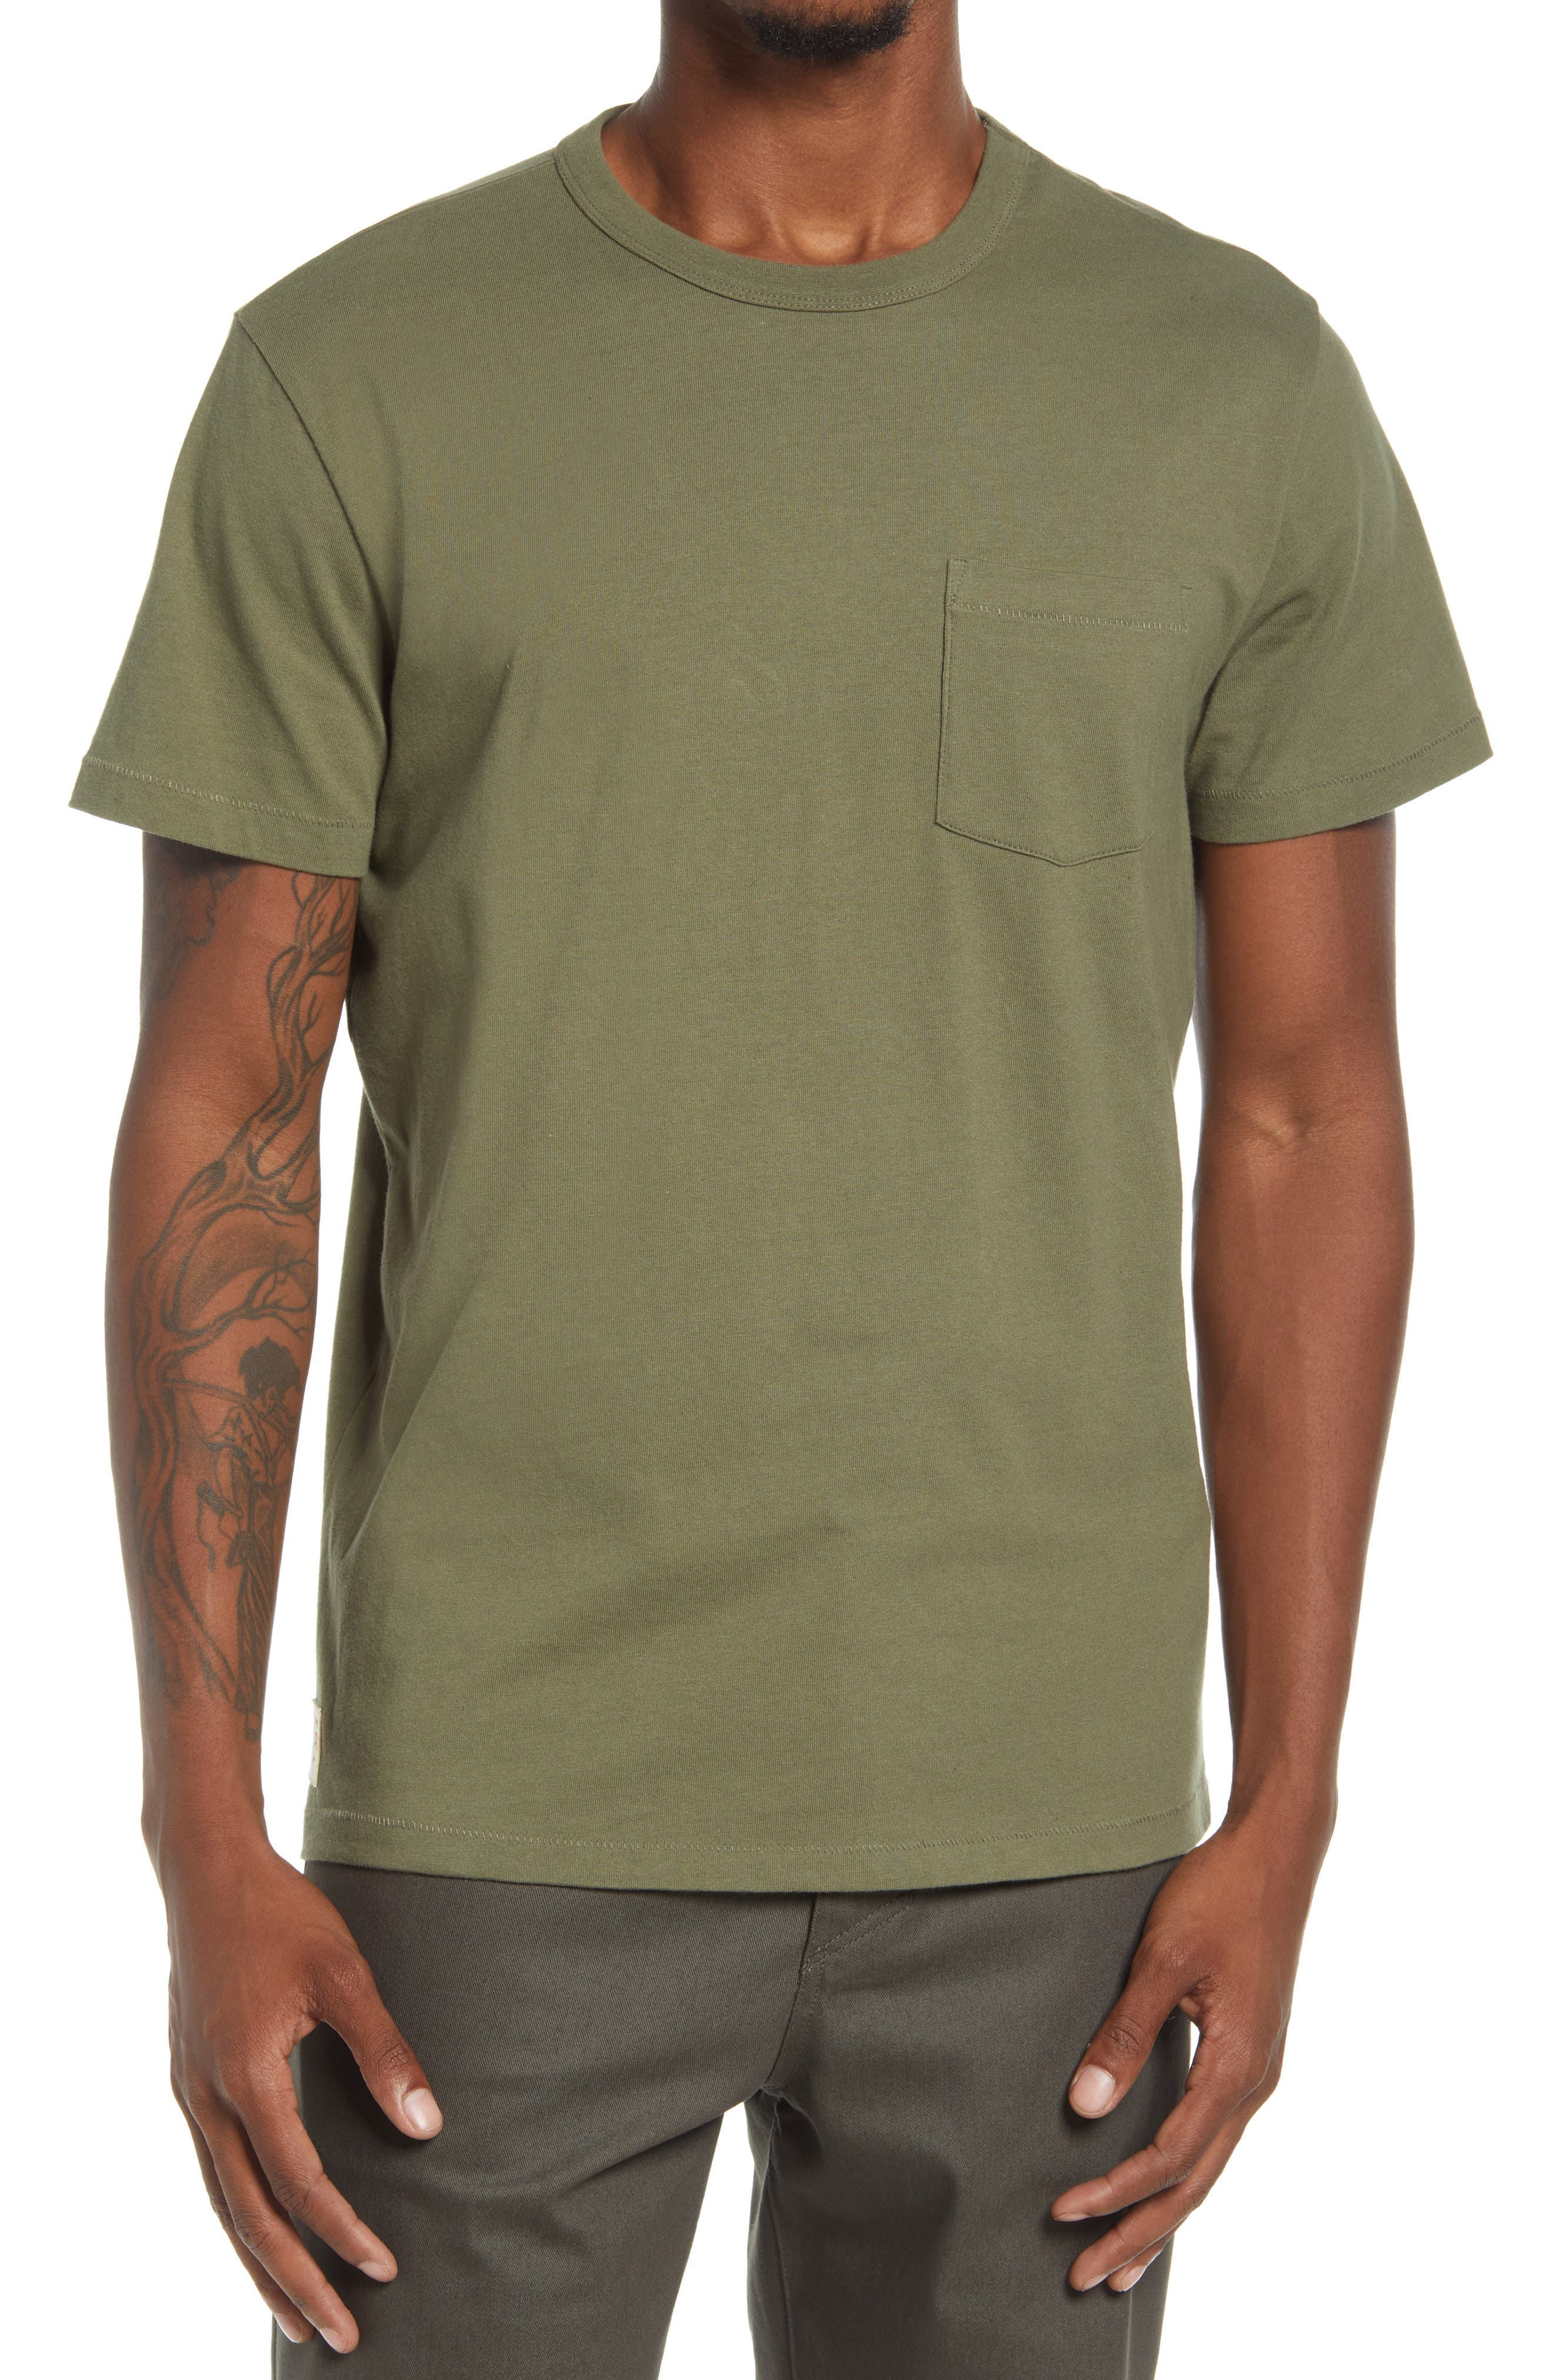 Every Damn Day Pocket Organic Cotton T-Shirt